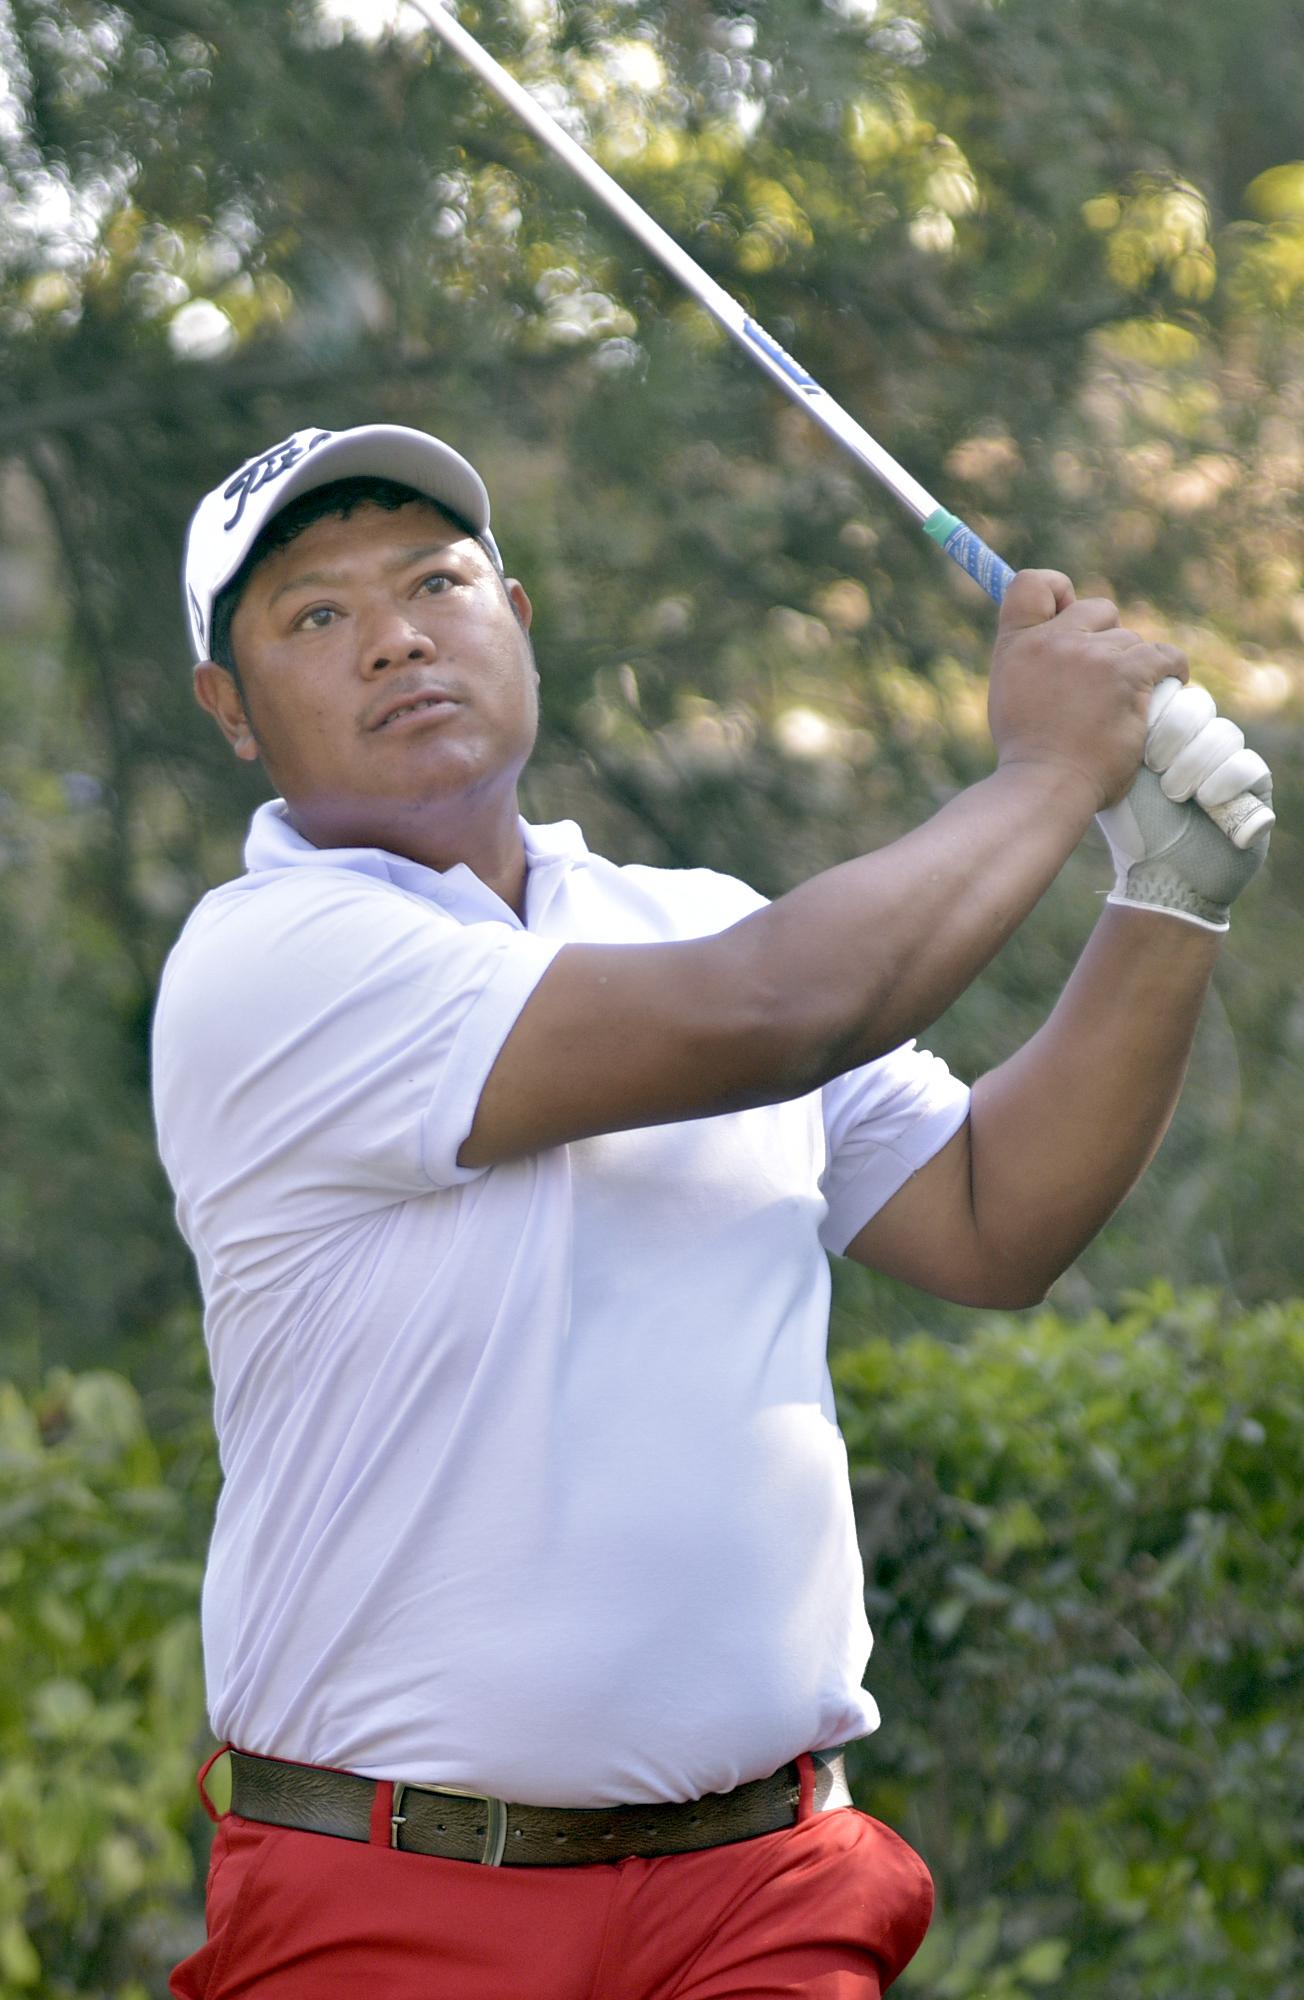 Shivaram Shrestha plays a shot on the ninth hole during the third round of the Surya Nepal Kathmandu Open at the Royal Nepal Golf Club in Kathmandu on Thursday, November 29, 2018. Photo: THT